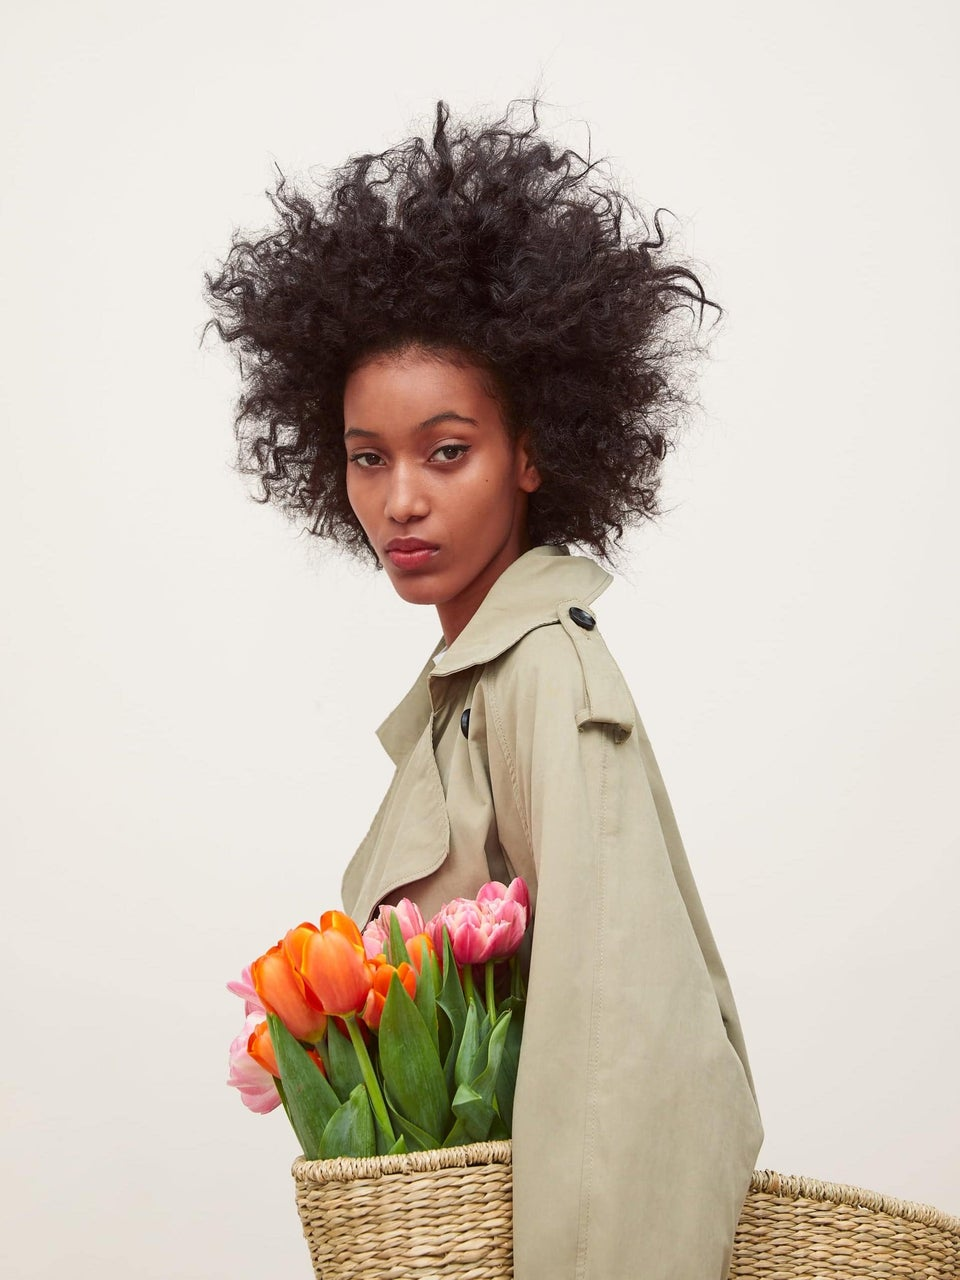 Spring Forward, Sis! Shop These 10 Trench Coats And Handbag Sets Under $50